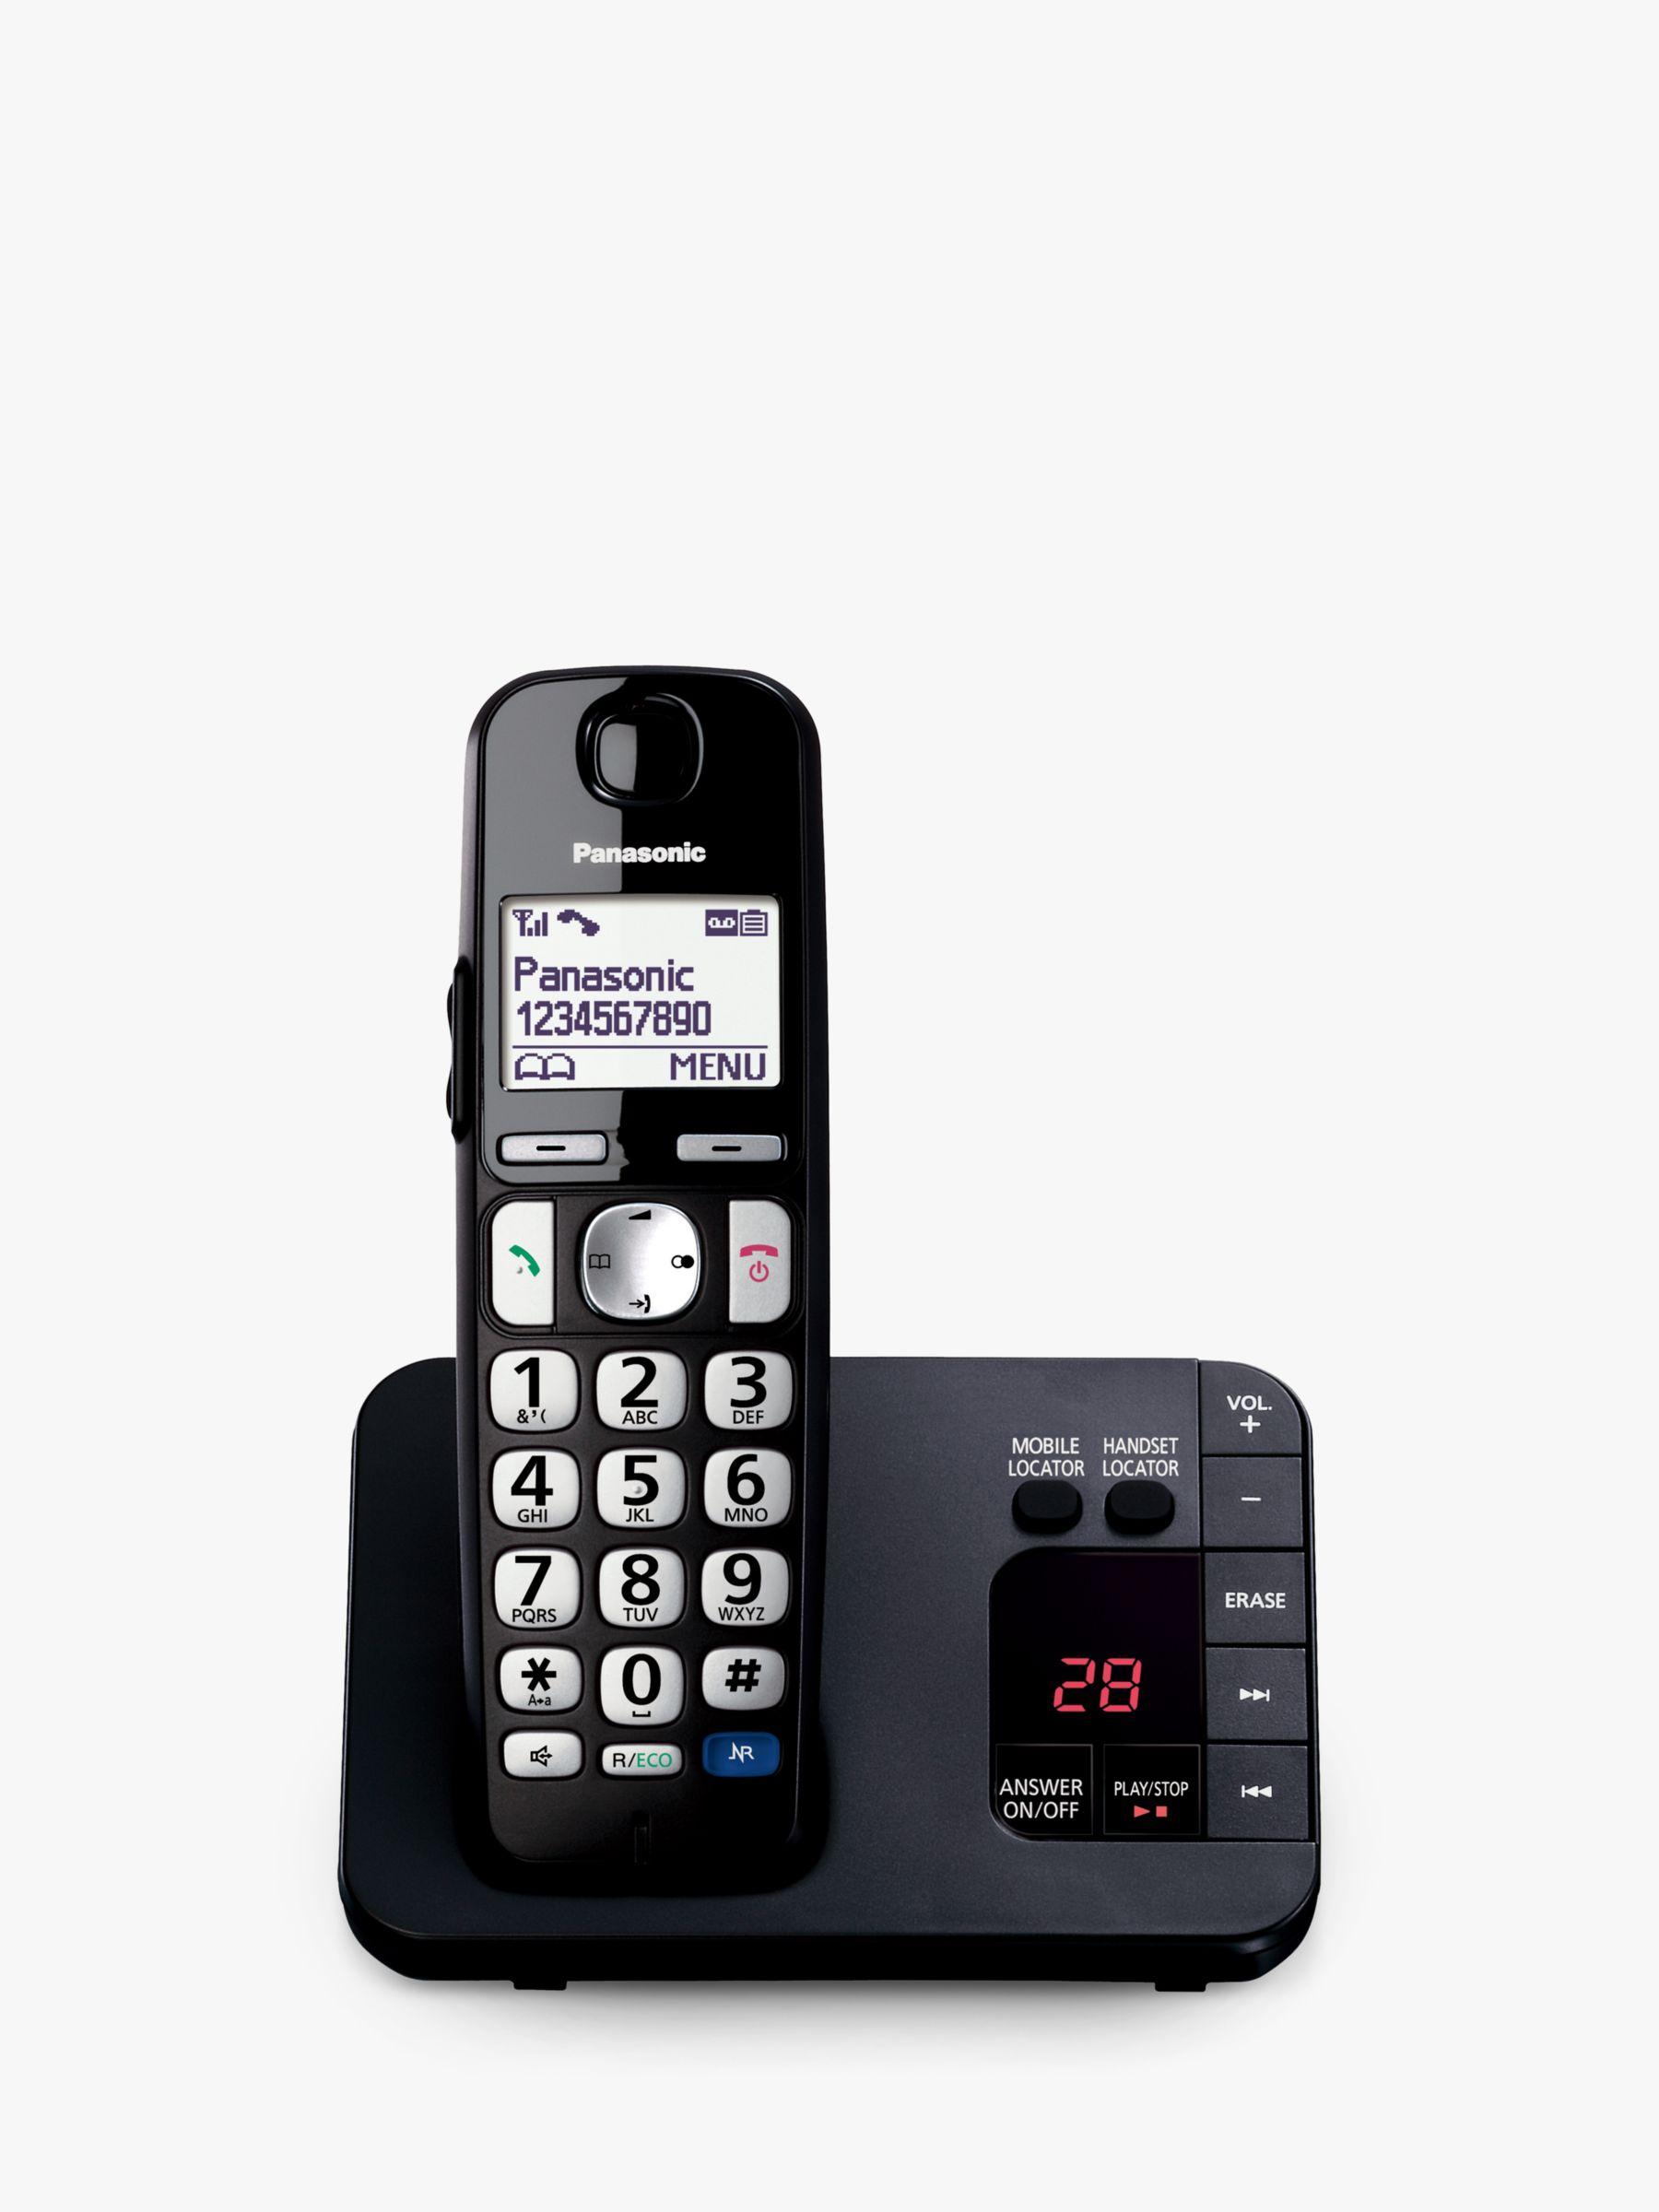 Panasonic Panasonic KX-TGE720EB Bigger Button Digital Cordless Telephone with 1.8 LCD Screen, Hearing Aid Compatibility, Nuisance Call Block & Answering Machine, Single Dect, Black